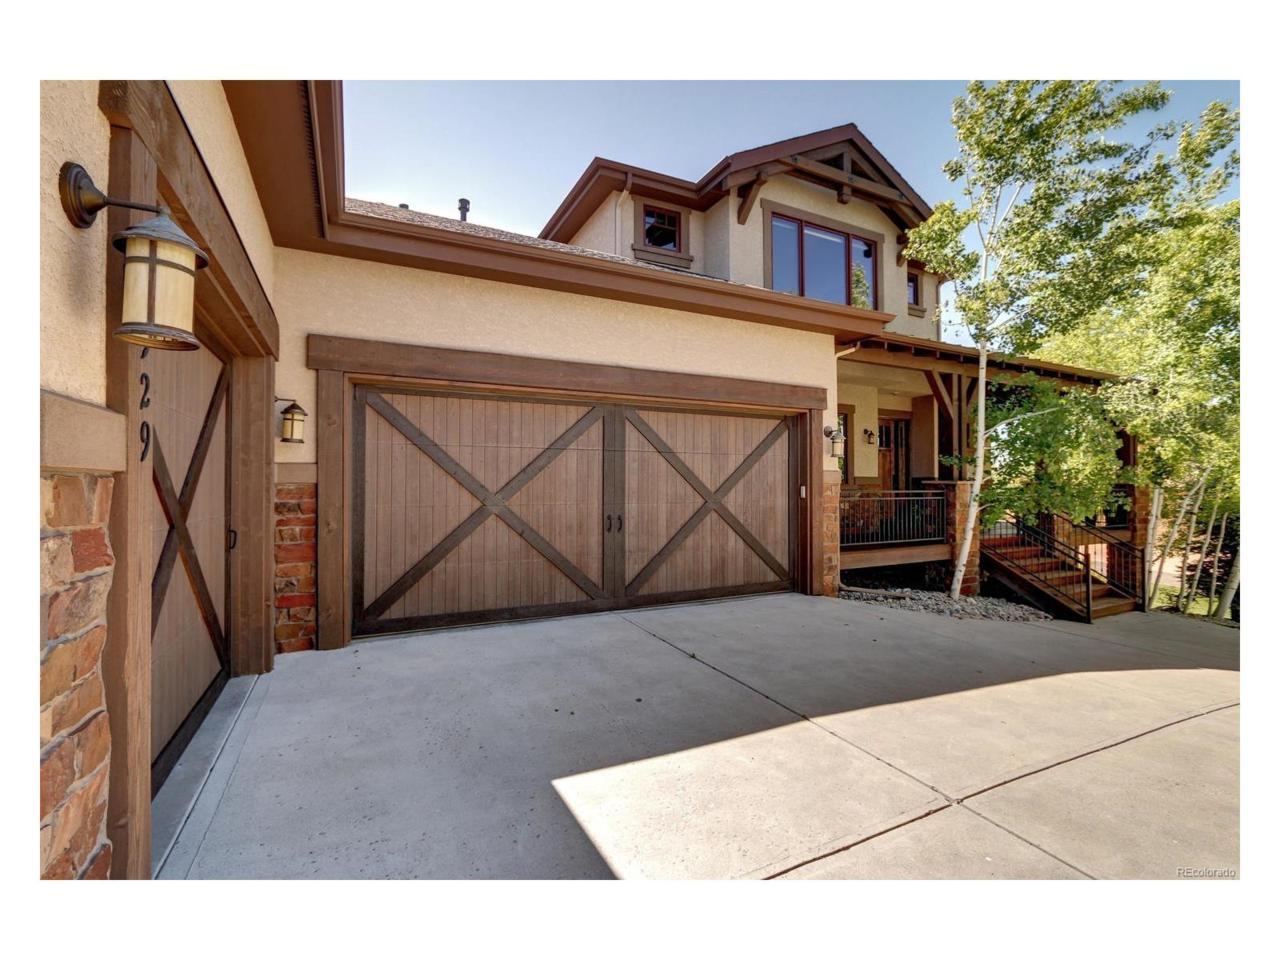 6929 S Eaton Street, Littleton, CO 80128 (MLS #6385708) :: 8z Real Estate